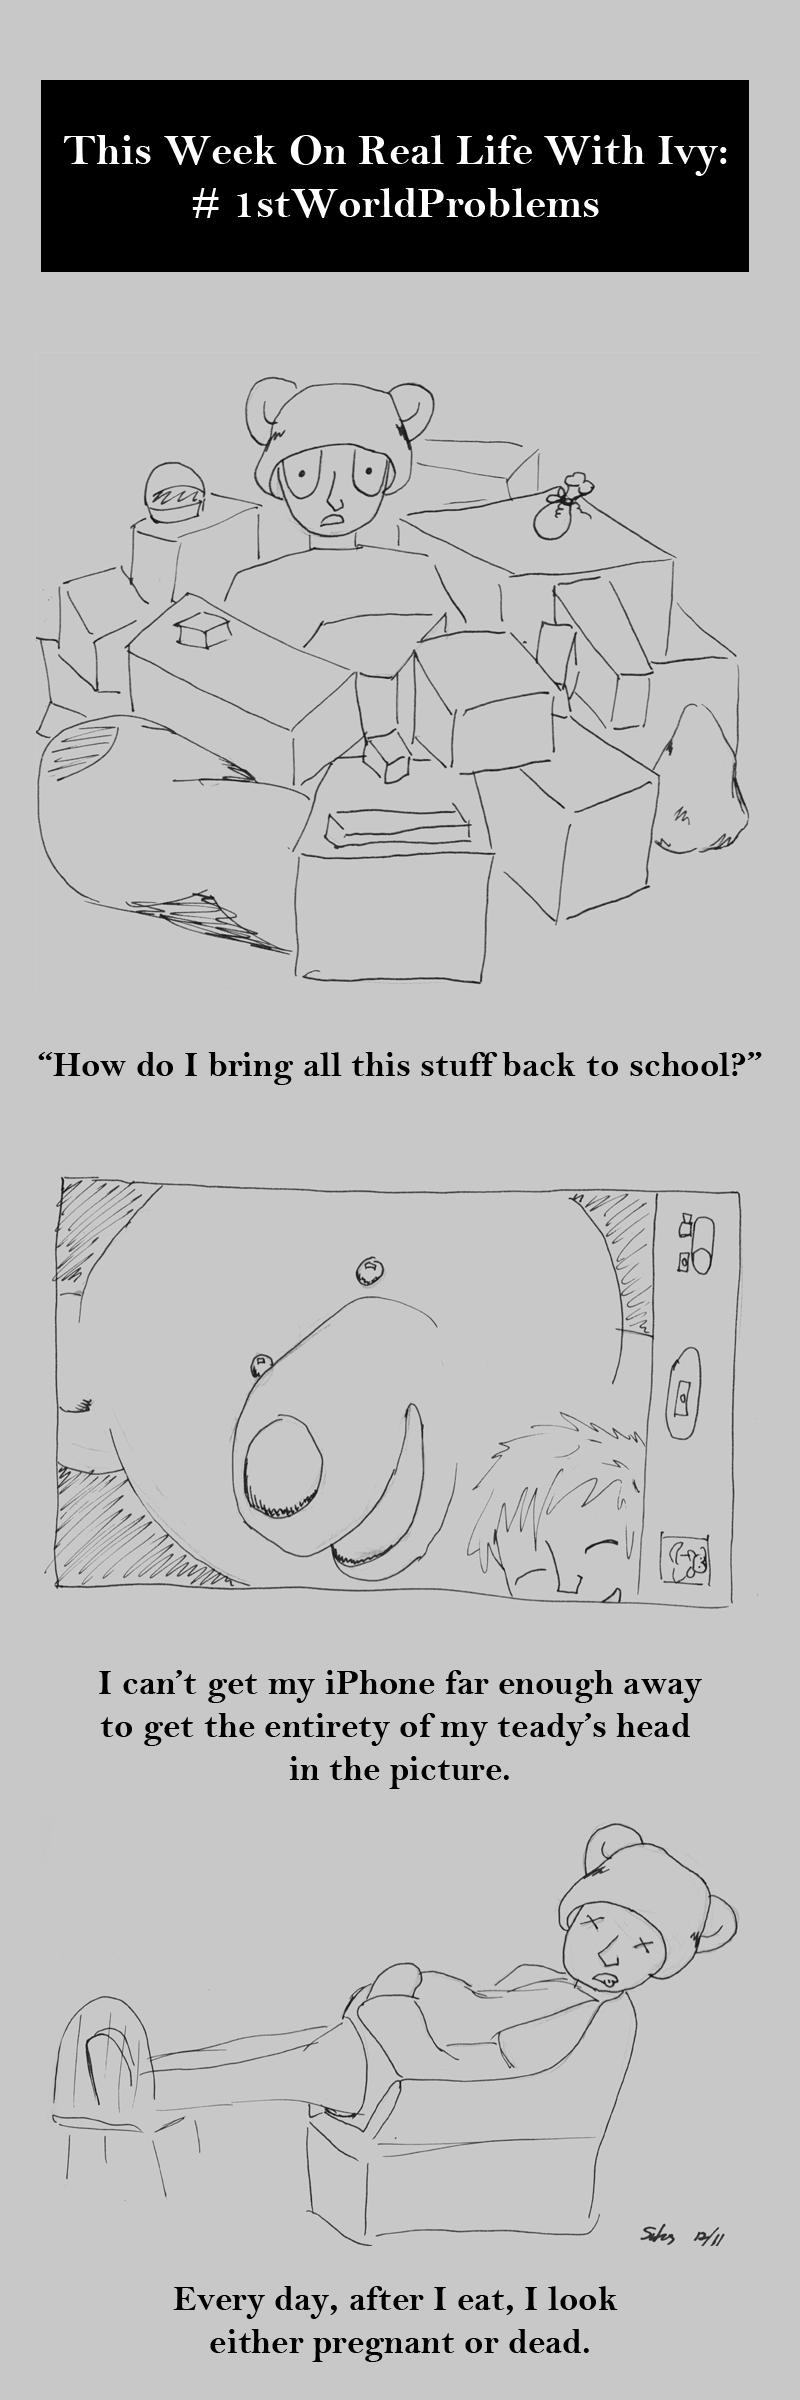 The Twenty-Sixth Comic